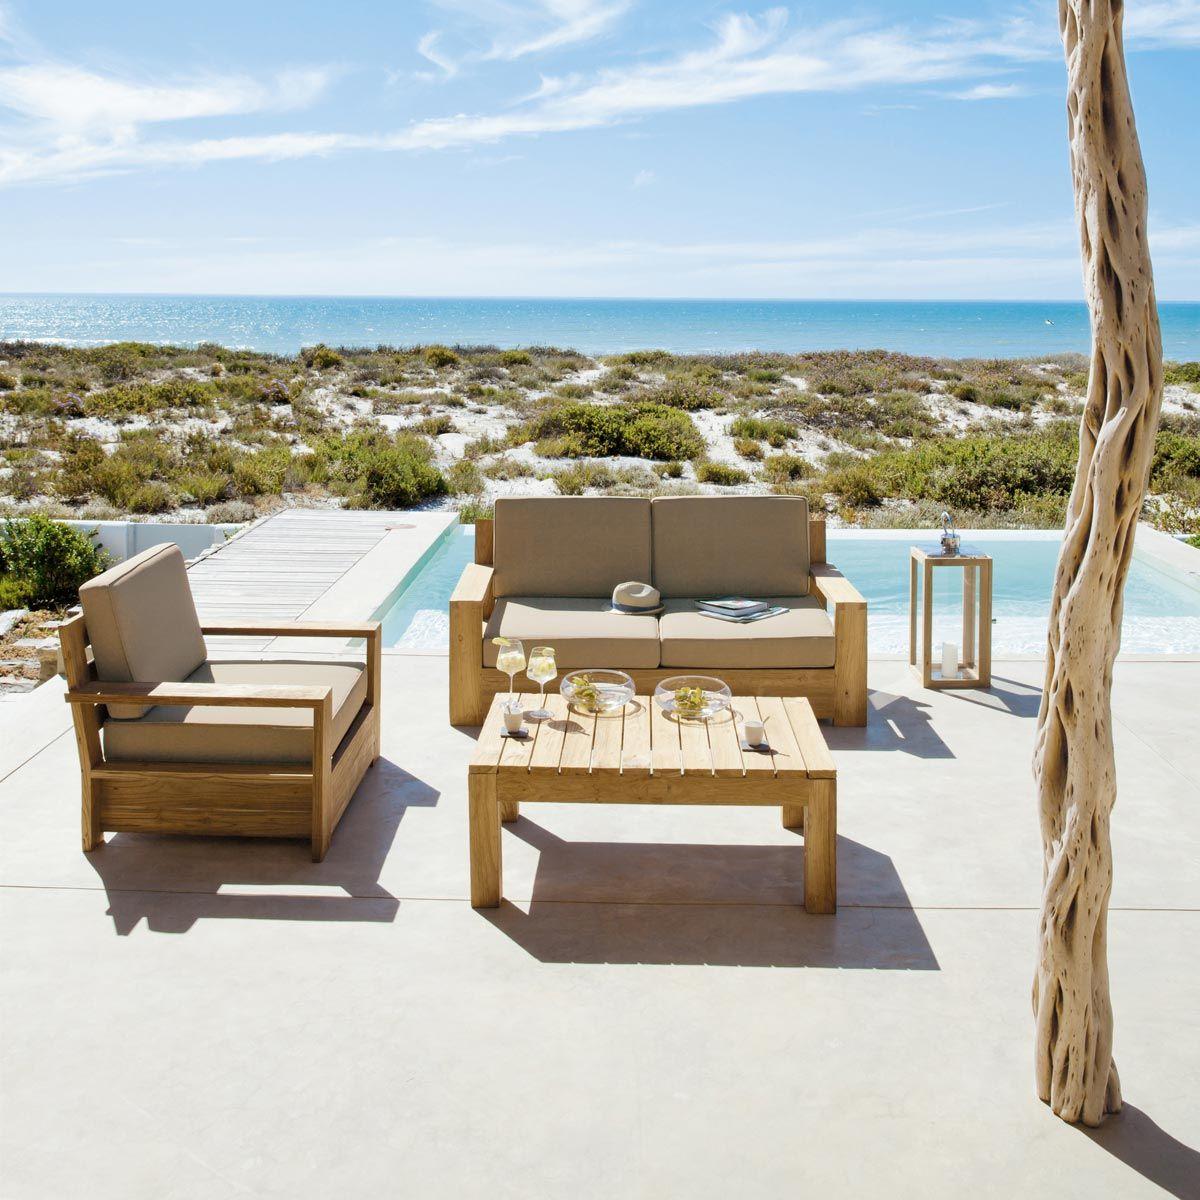 Outdoor Furniture | Teak Garden Bench, Outdoor Furniture ... à Salon De Jardin Maison Du Monde